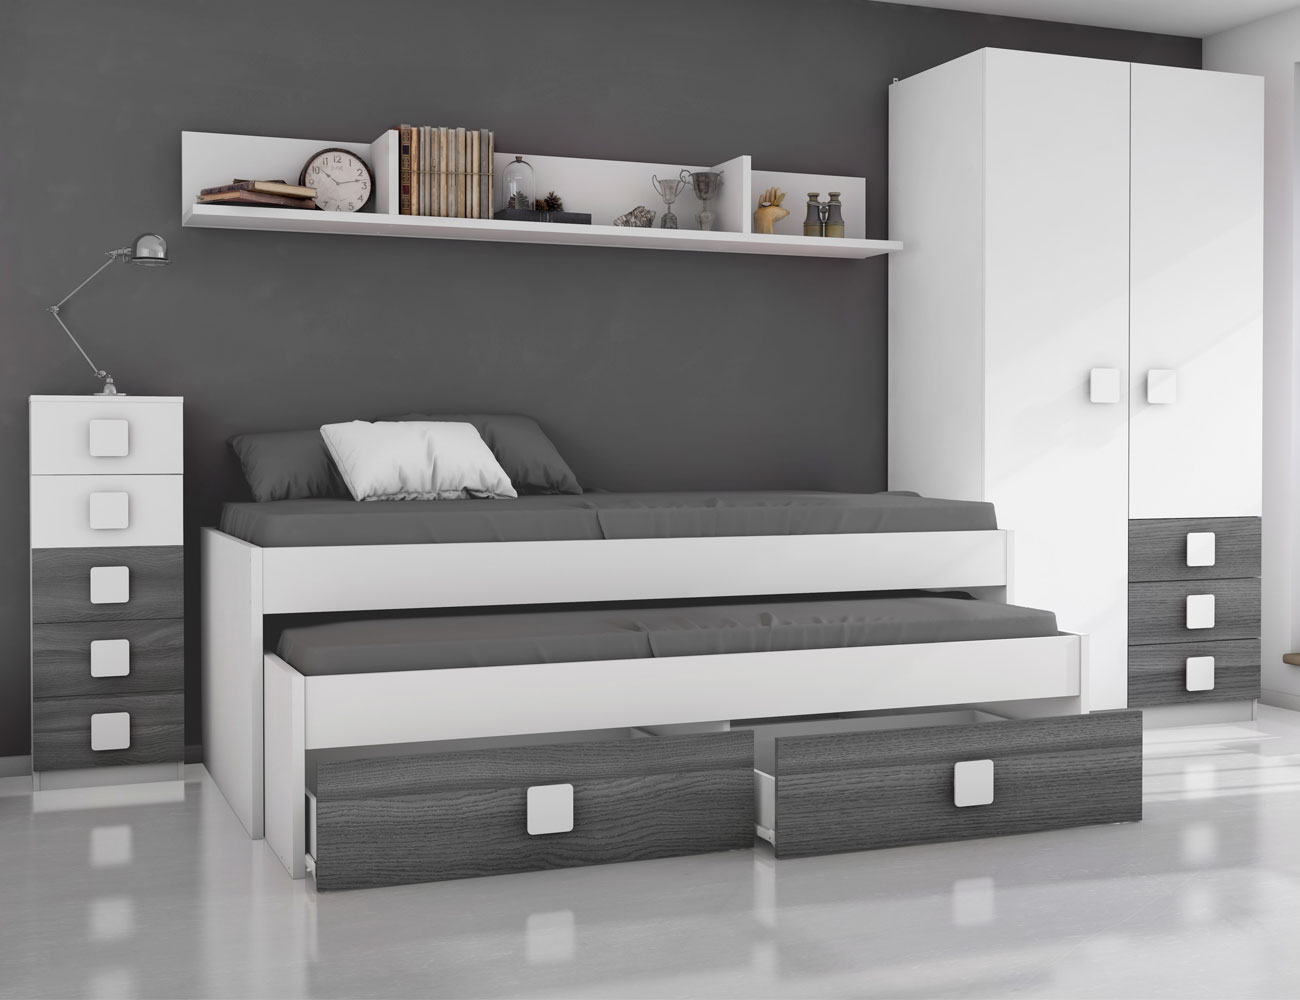 Dormitorio juvenil ceniza blanco